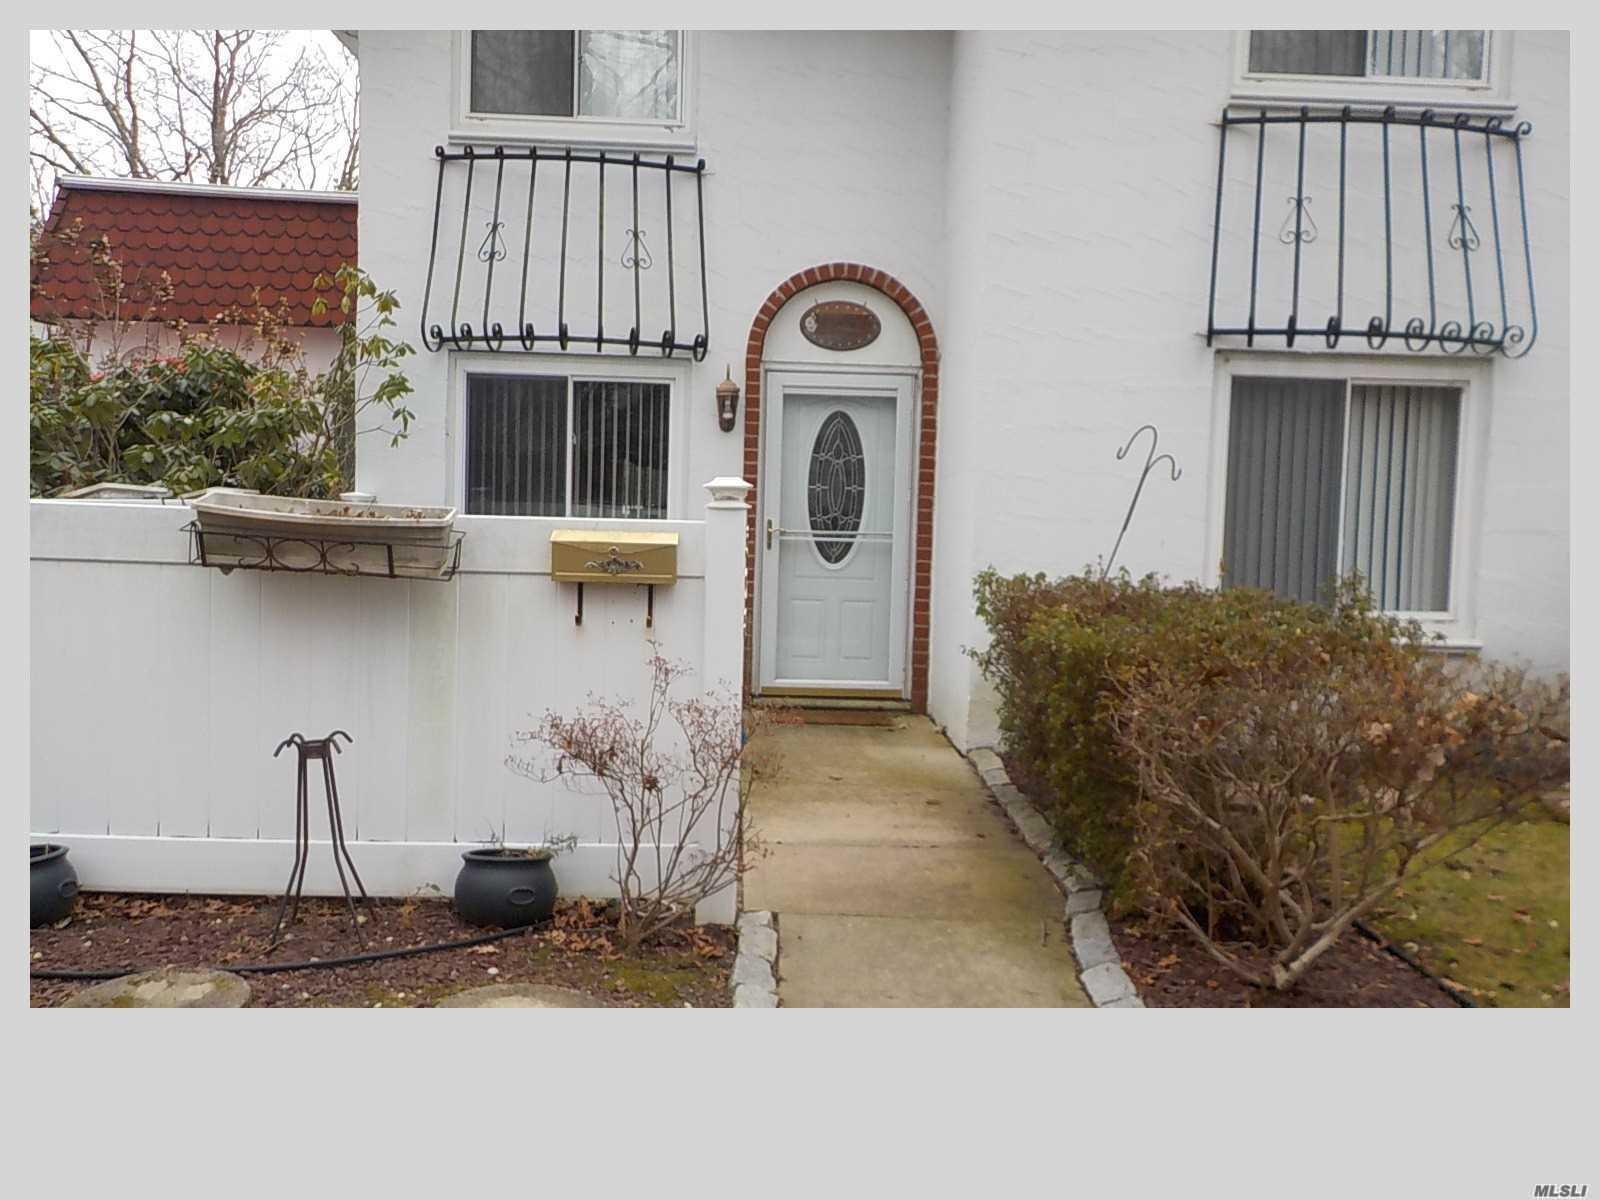 Property for sale at 398 Birchwood Road, Medford NY 11763, Medford,  New York 11763